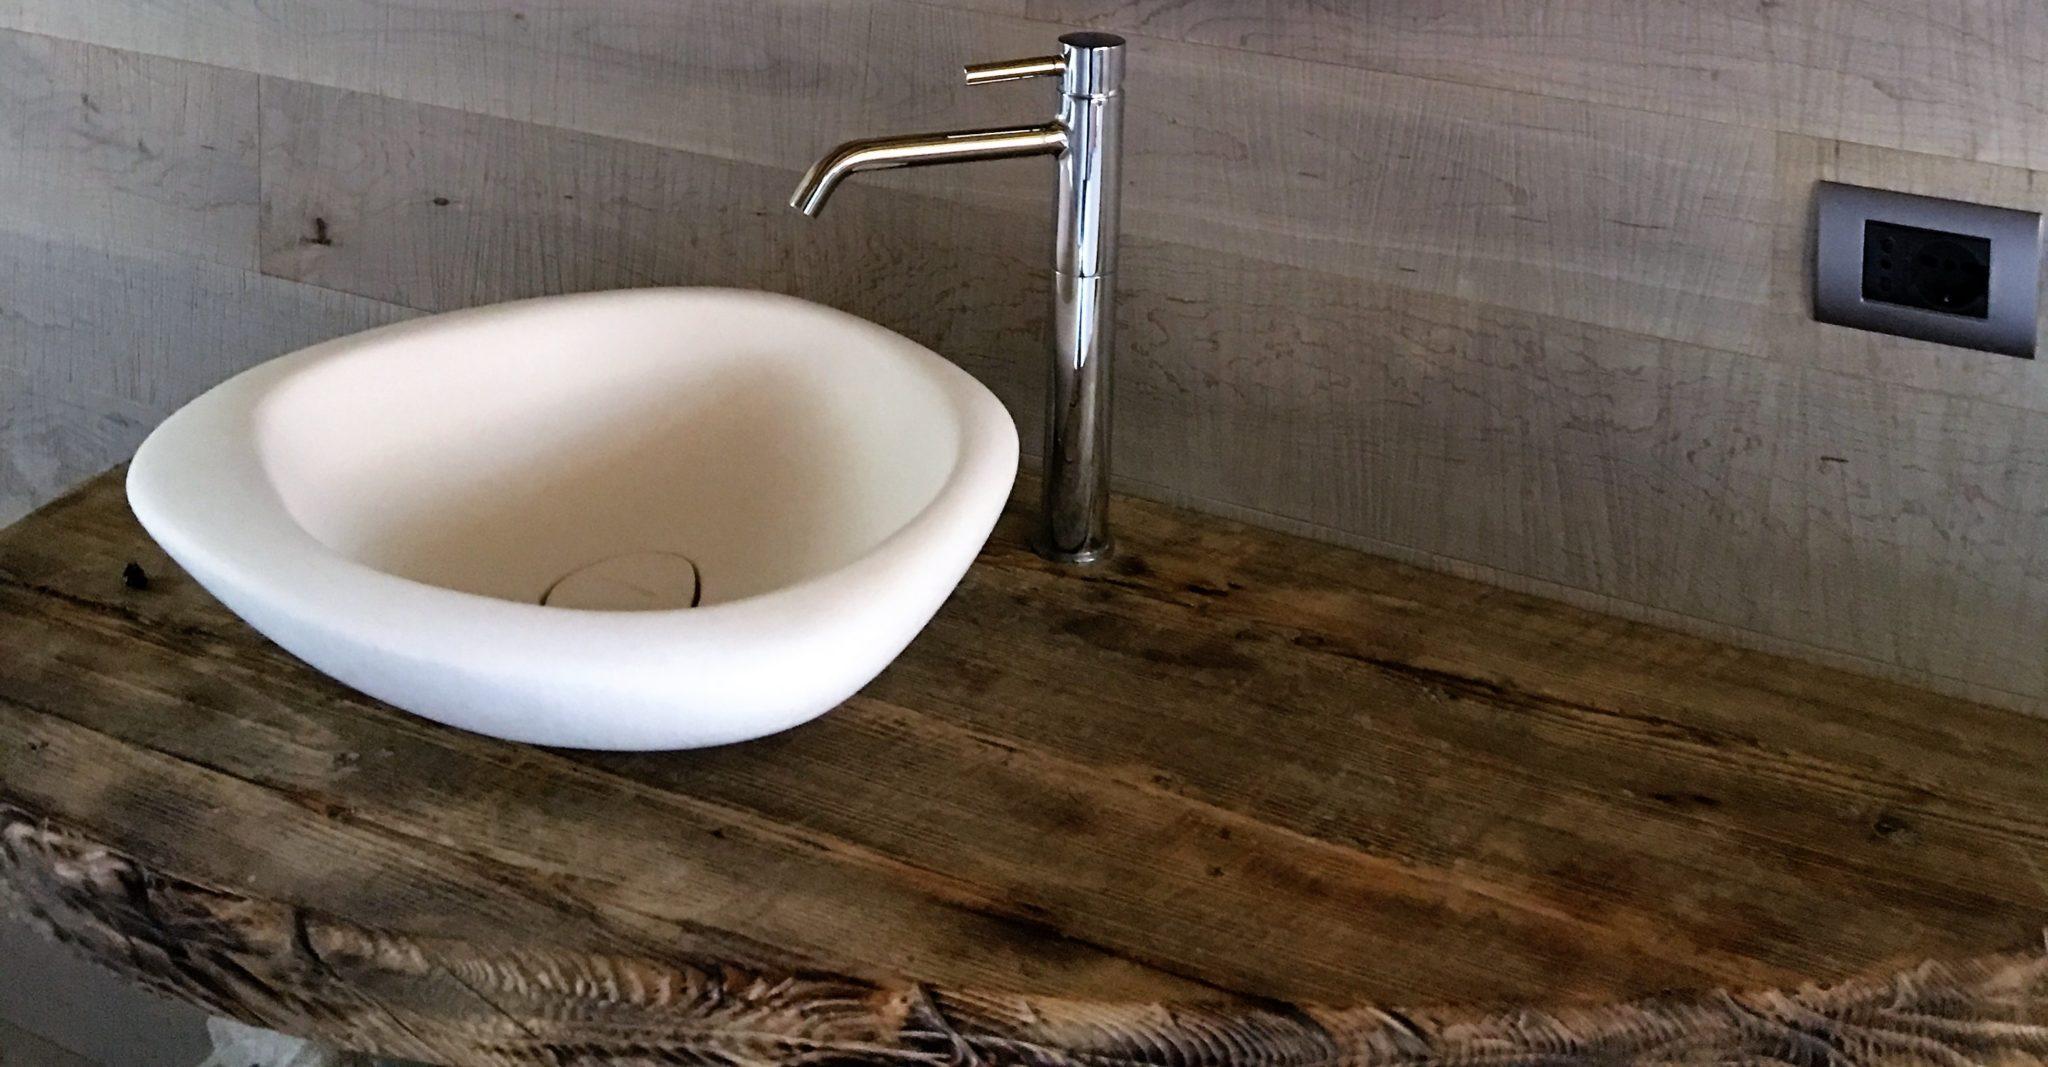 Arredo bagno,mobili bagno,mobili bagno sospesi e a terra - soppalco1 1